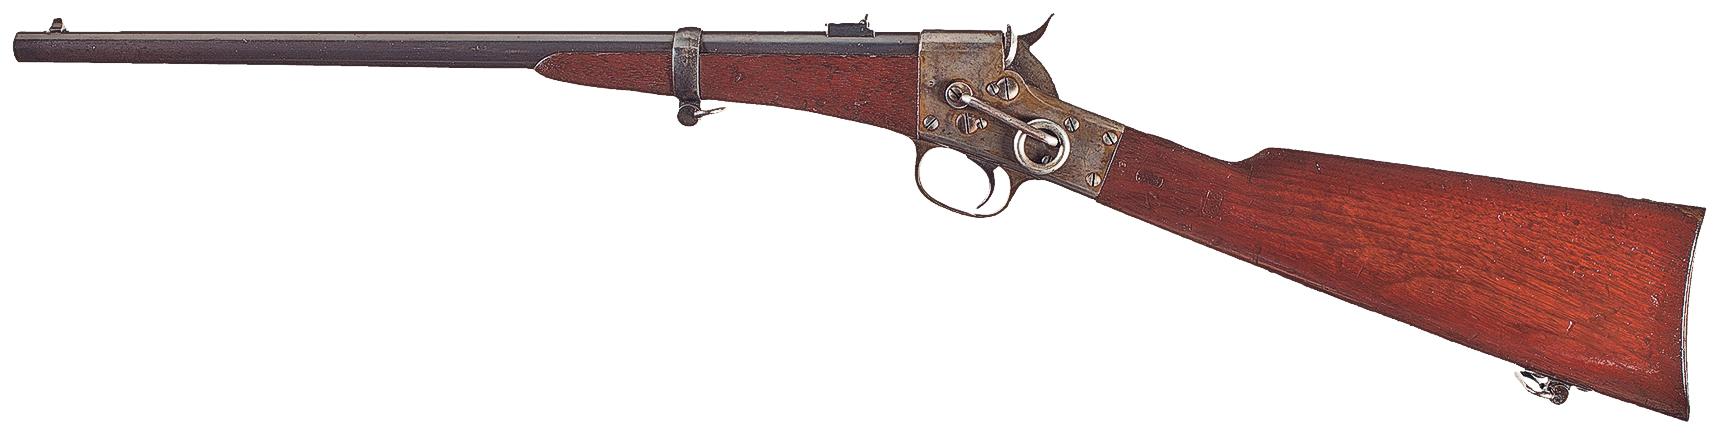 RR_KS-Remington-Rock-Island-Auction-House-HAB1713-T-F1-L